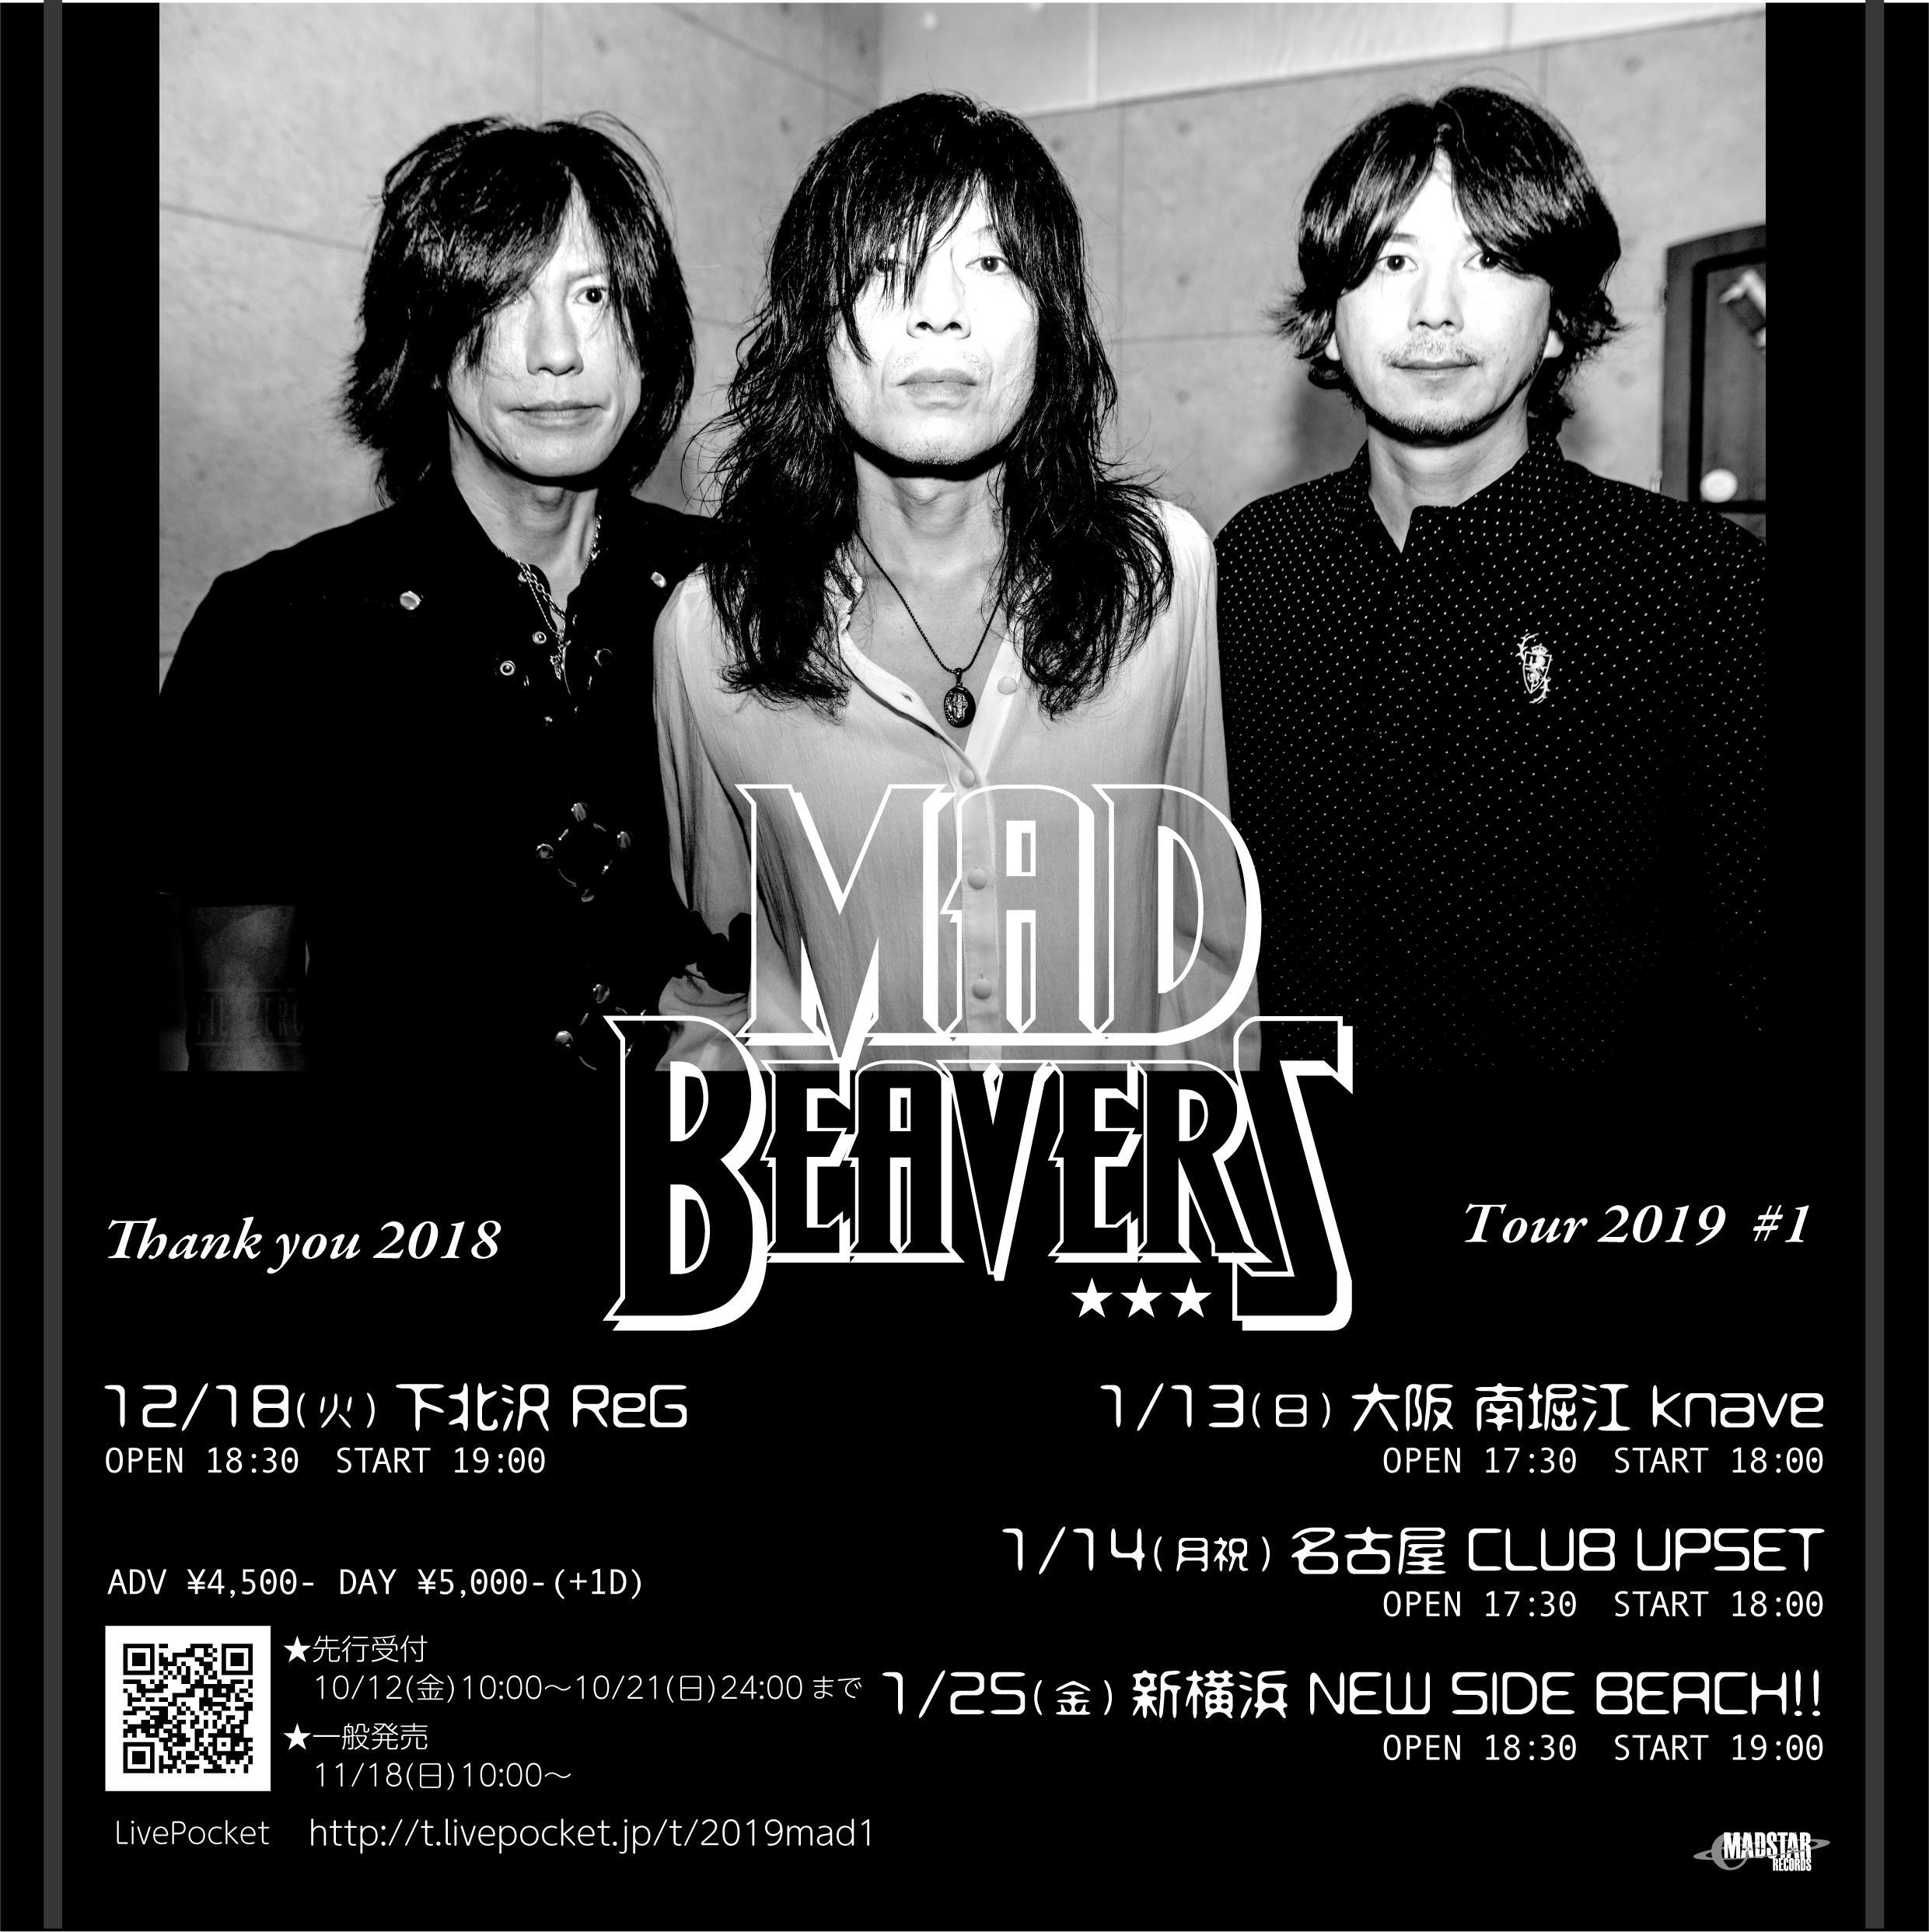 MADBEAVERS  Tour 2019  #1 1/25 新横浜 NEW SIDE BEACH!! 先行チケット